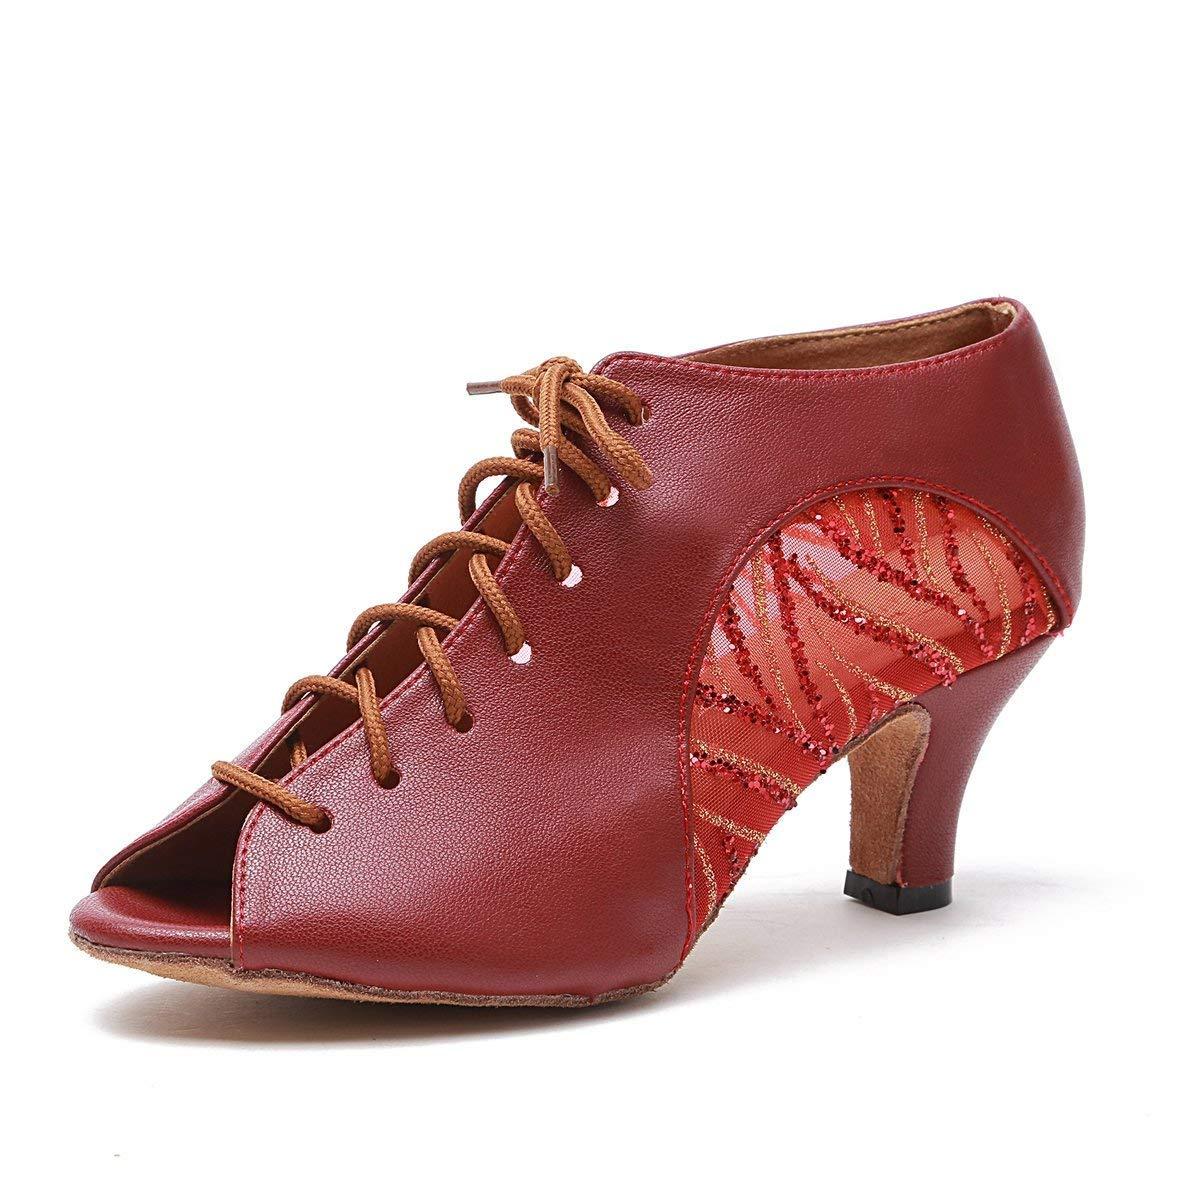 Qiusa Frauen Lace-up rot Mesh Leder Latin Dancing Schuhe Ankle Sandalen UK 4.5 (Farbe   - Größe   -)